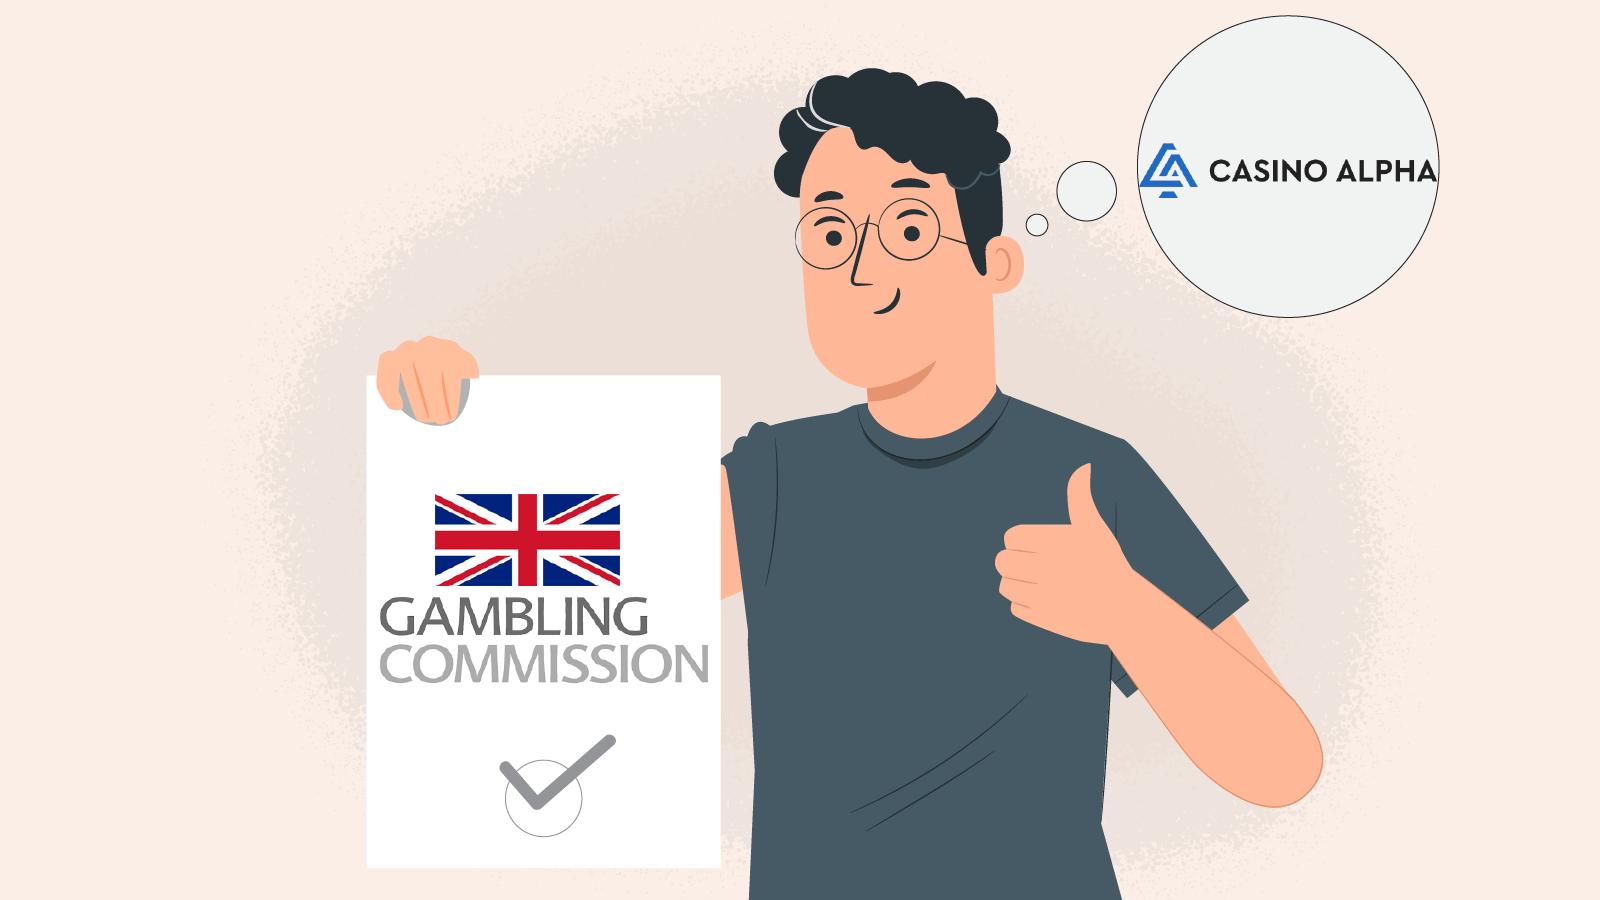 CasinoAlpha's always conform with the UKGC